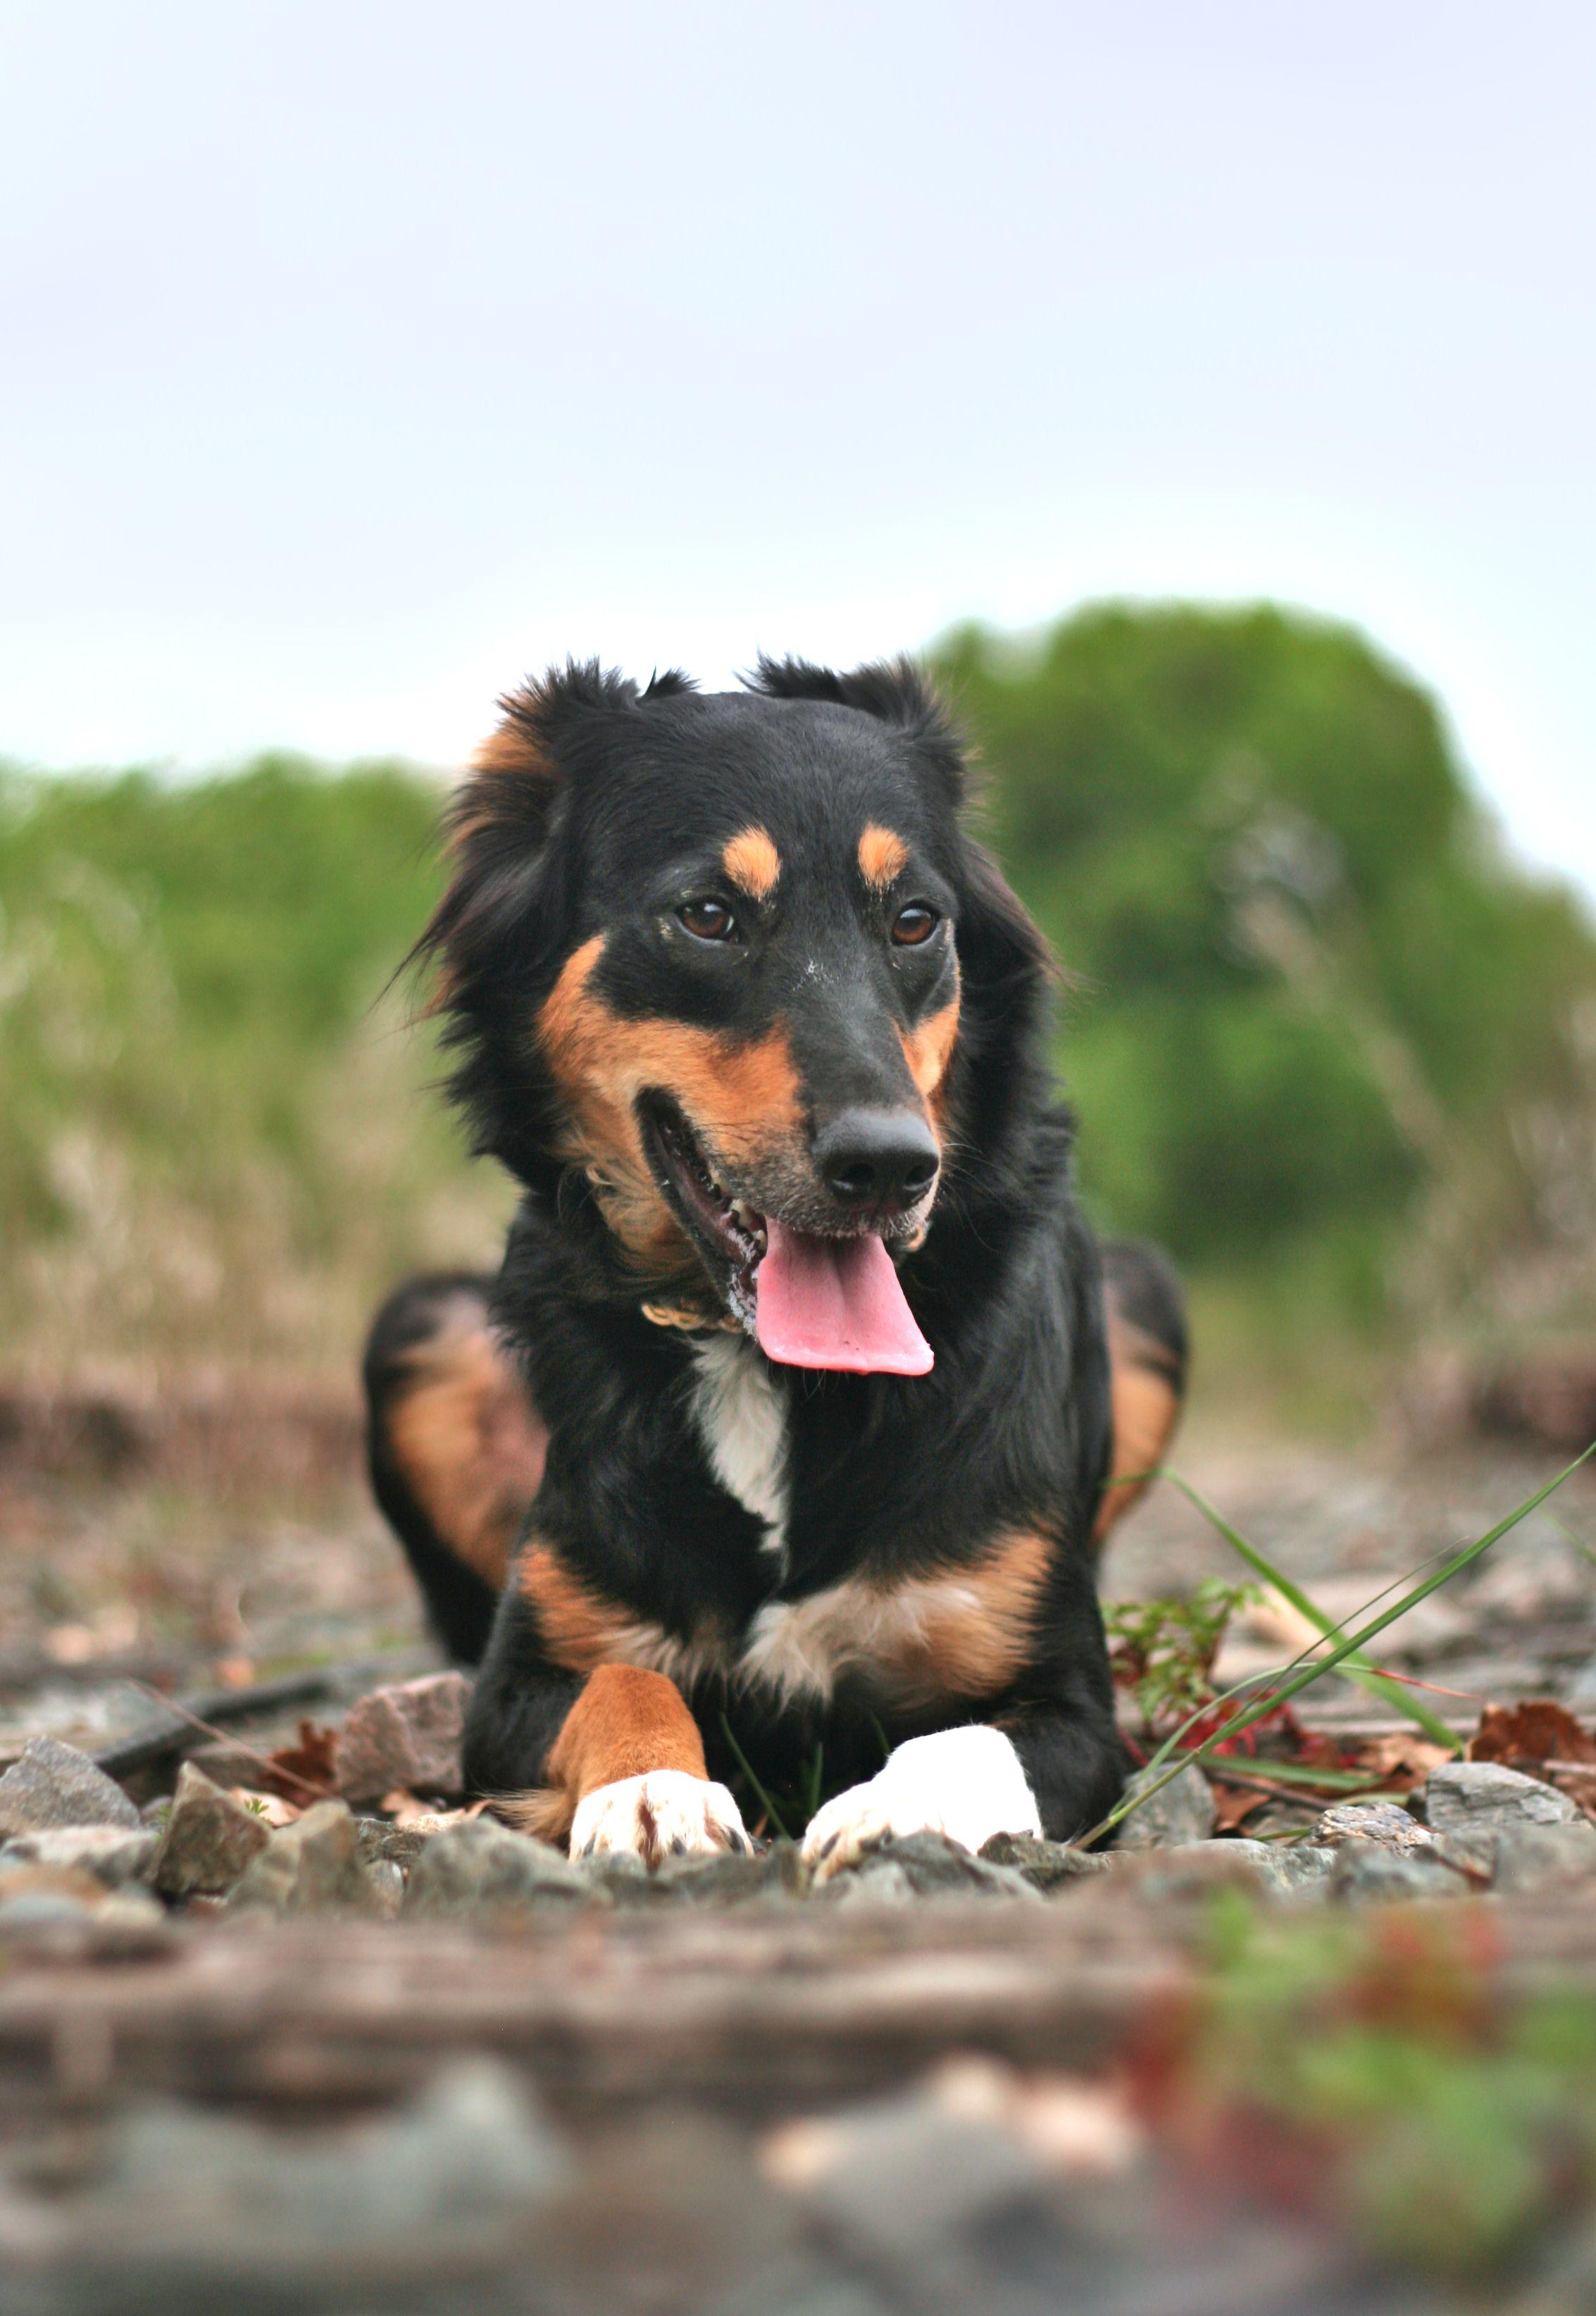 kallya-chien-concours-photo-animaux-mai-2019